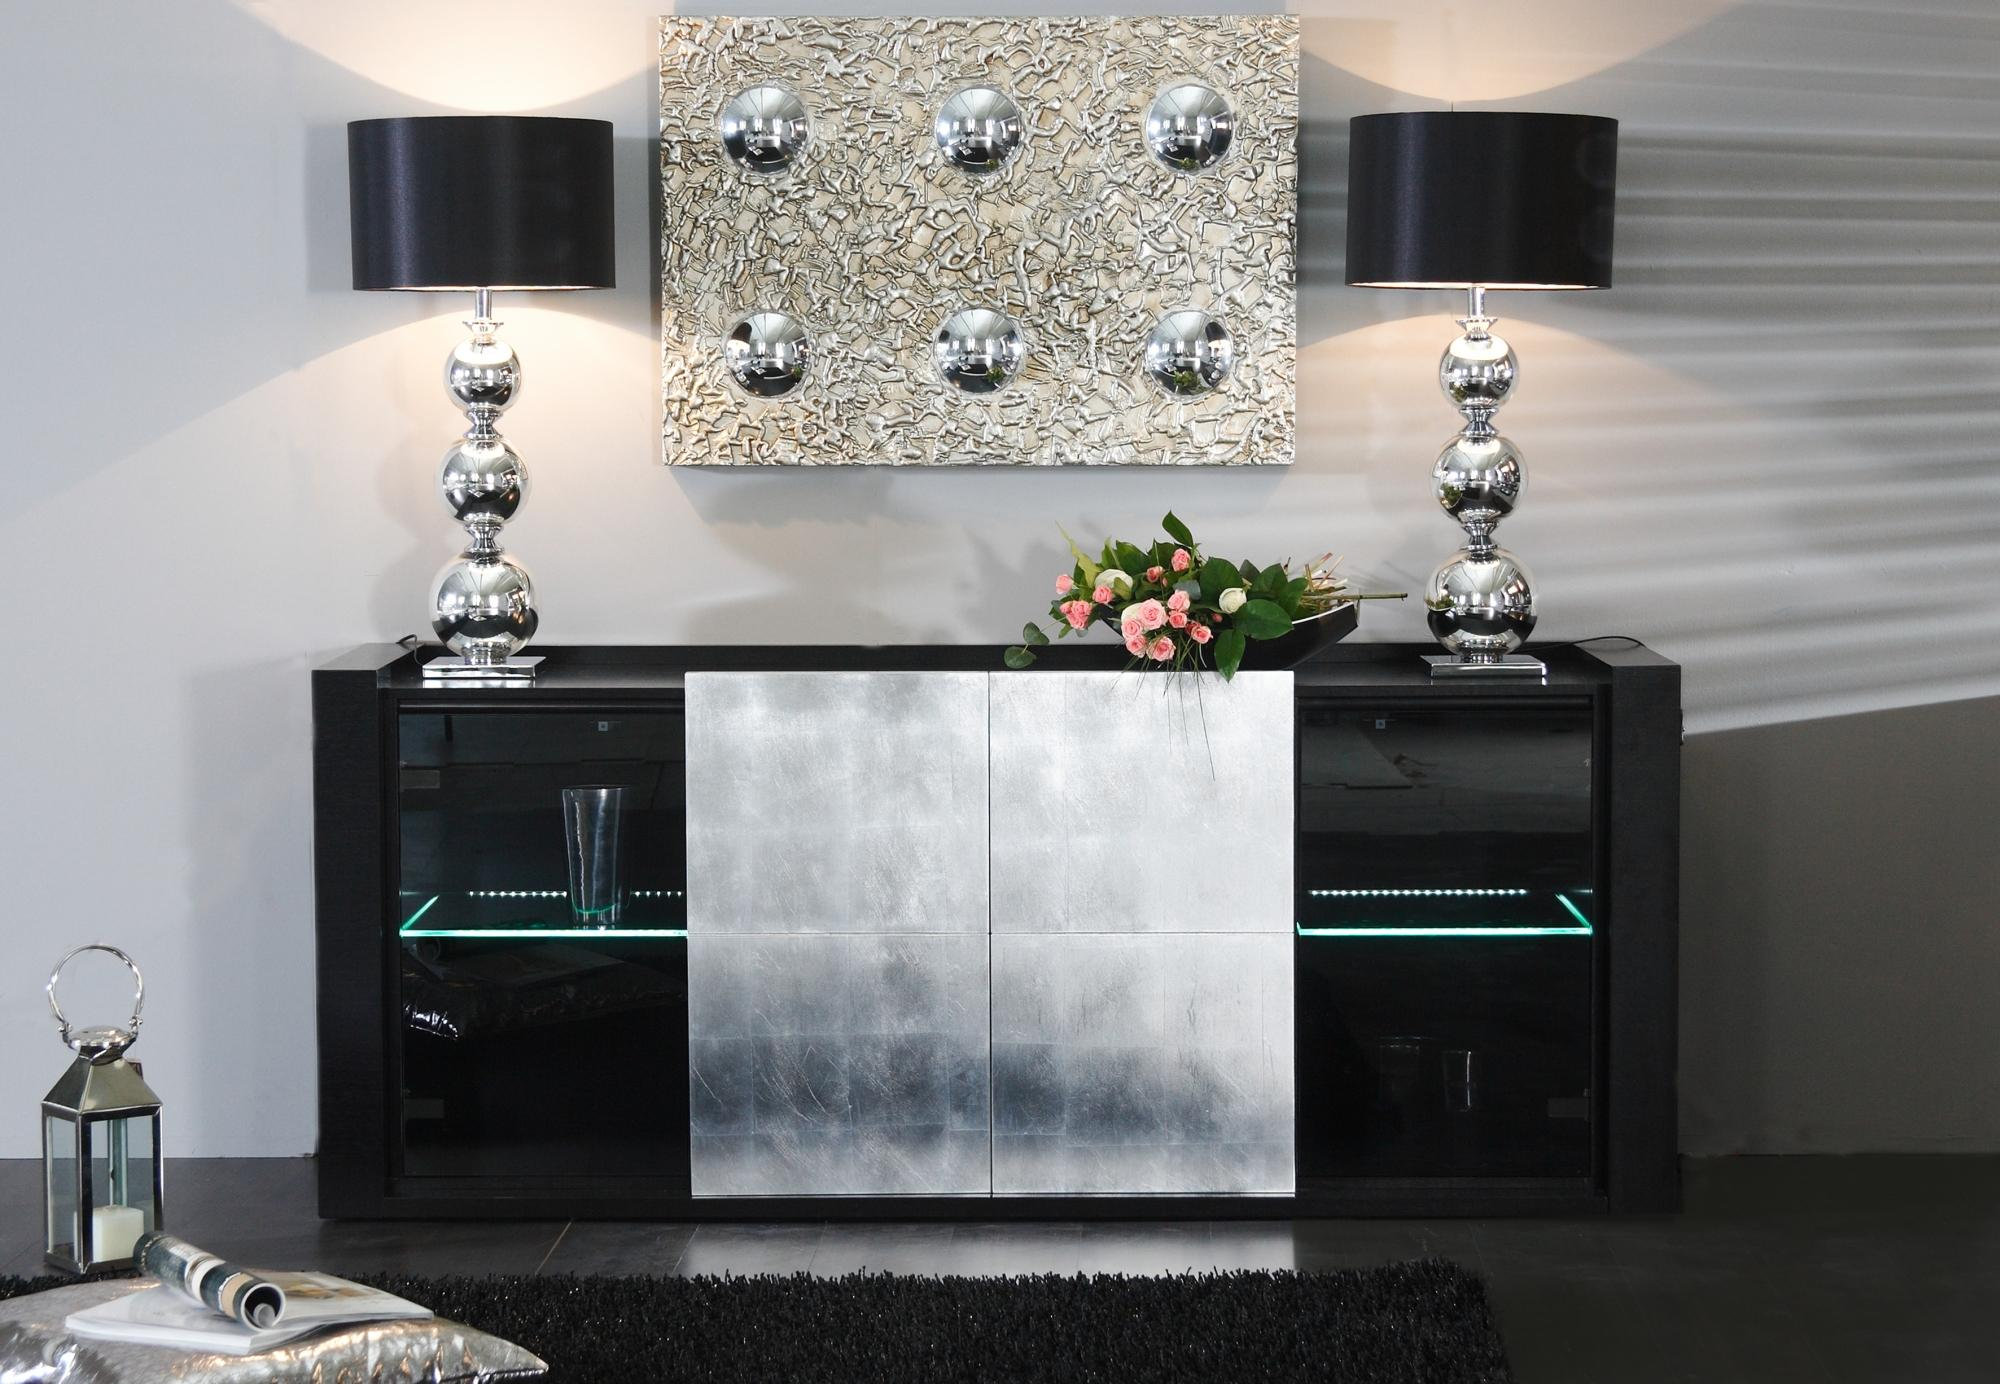 Set Sala Da Pranzo Design 1.0 500.0 Pezzi #656249 2000 1384 Sala Da Pranzo Dell'hotel